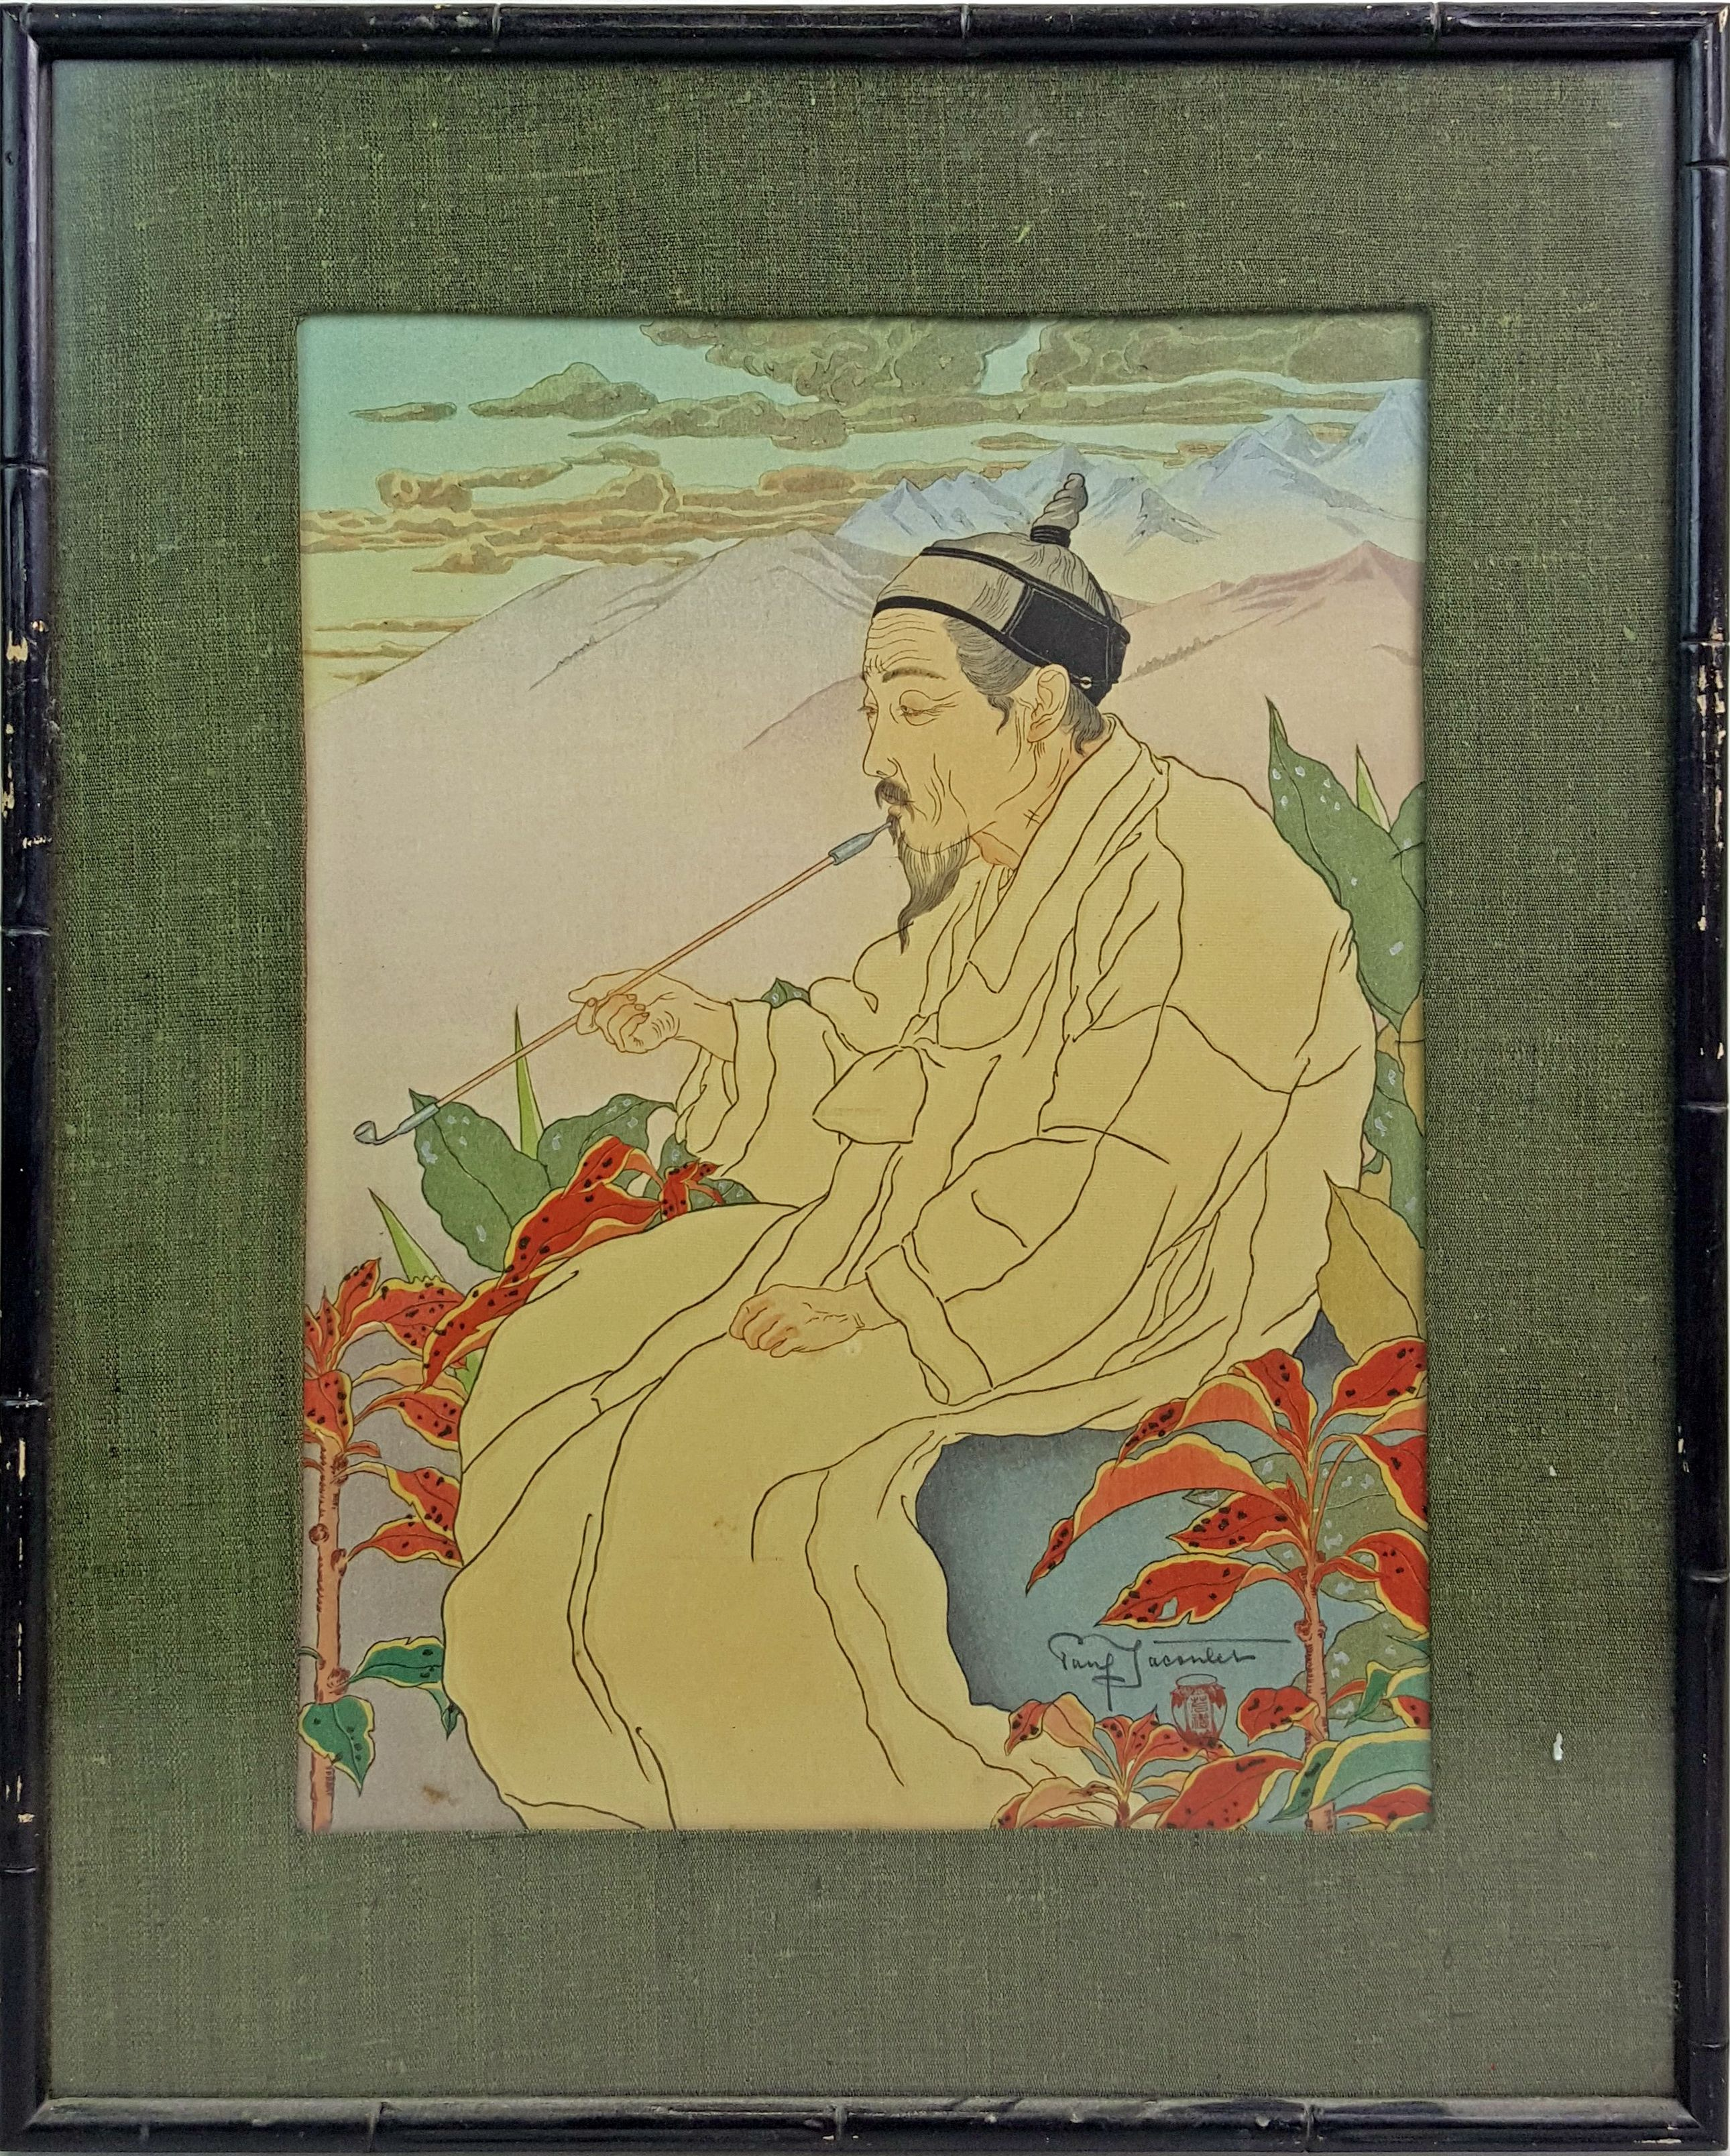 "Lot 1365: Paul Jacoulet (1902-1960) Pencil Signed Woodblock ""Hokklan-Zan Seoul, Cree"" Print March 26, 2016"